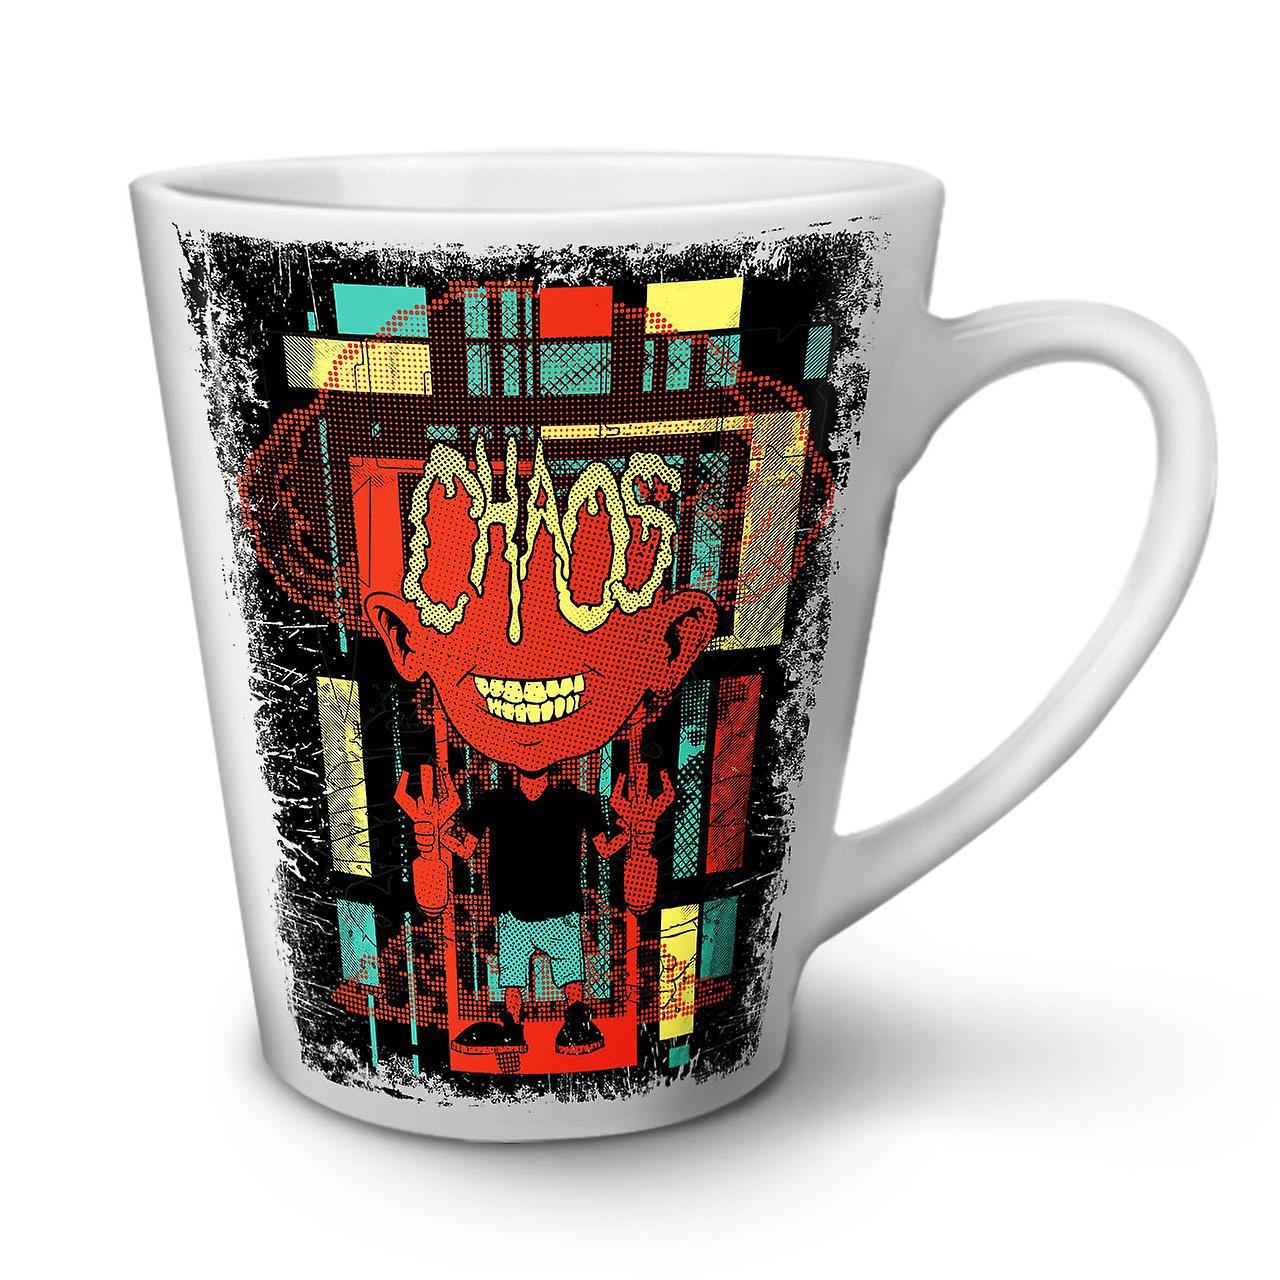 Nouvelle En Chaos Mort OzWellcoda Tasse Zombie Blanche Café Céramique Latte Fashion 12 k8OPw0NnX